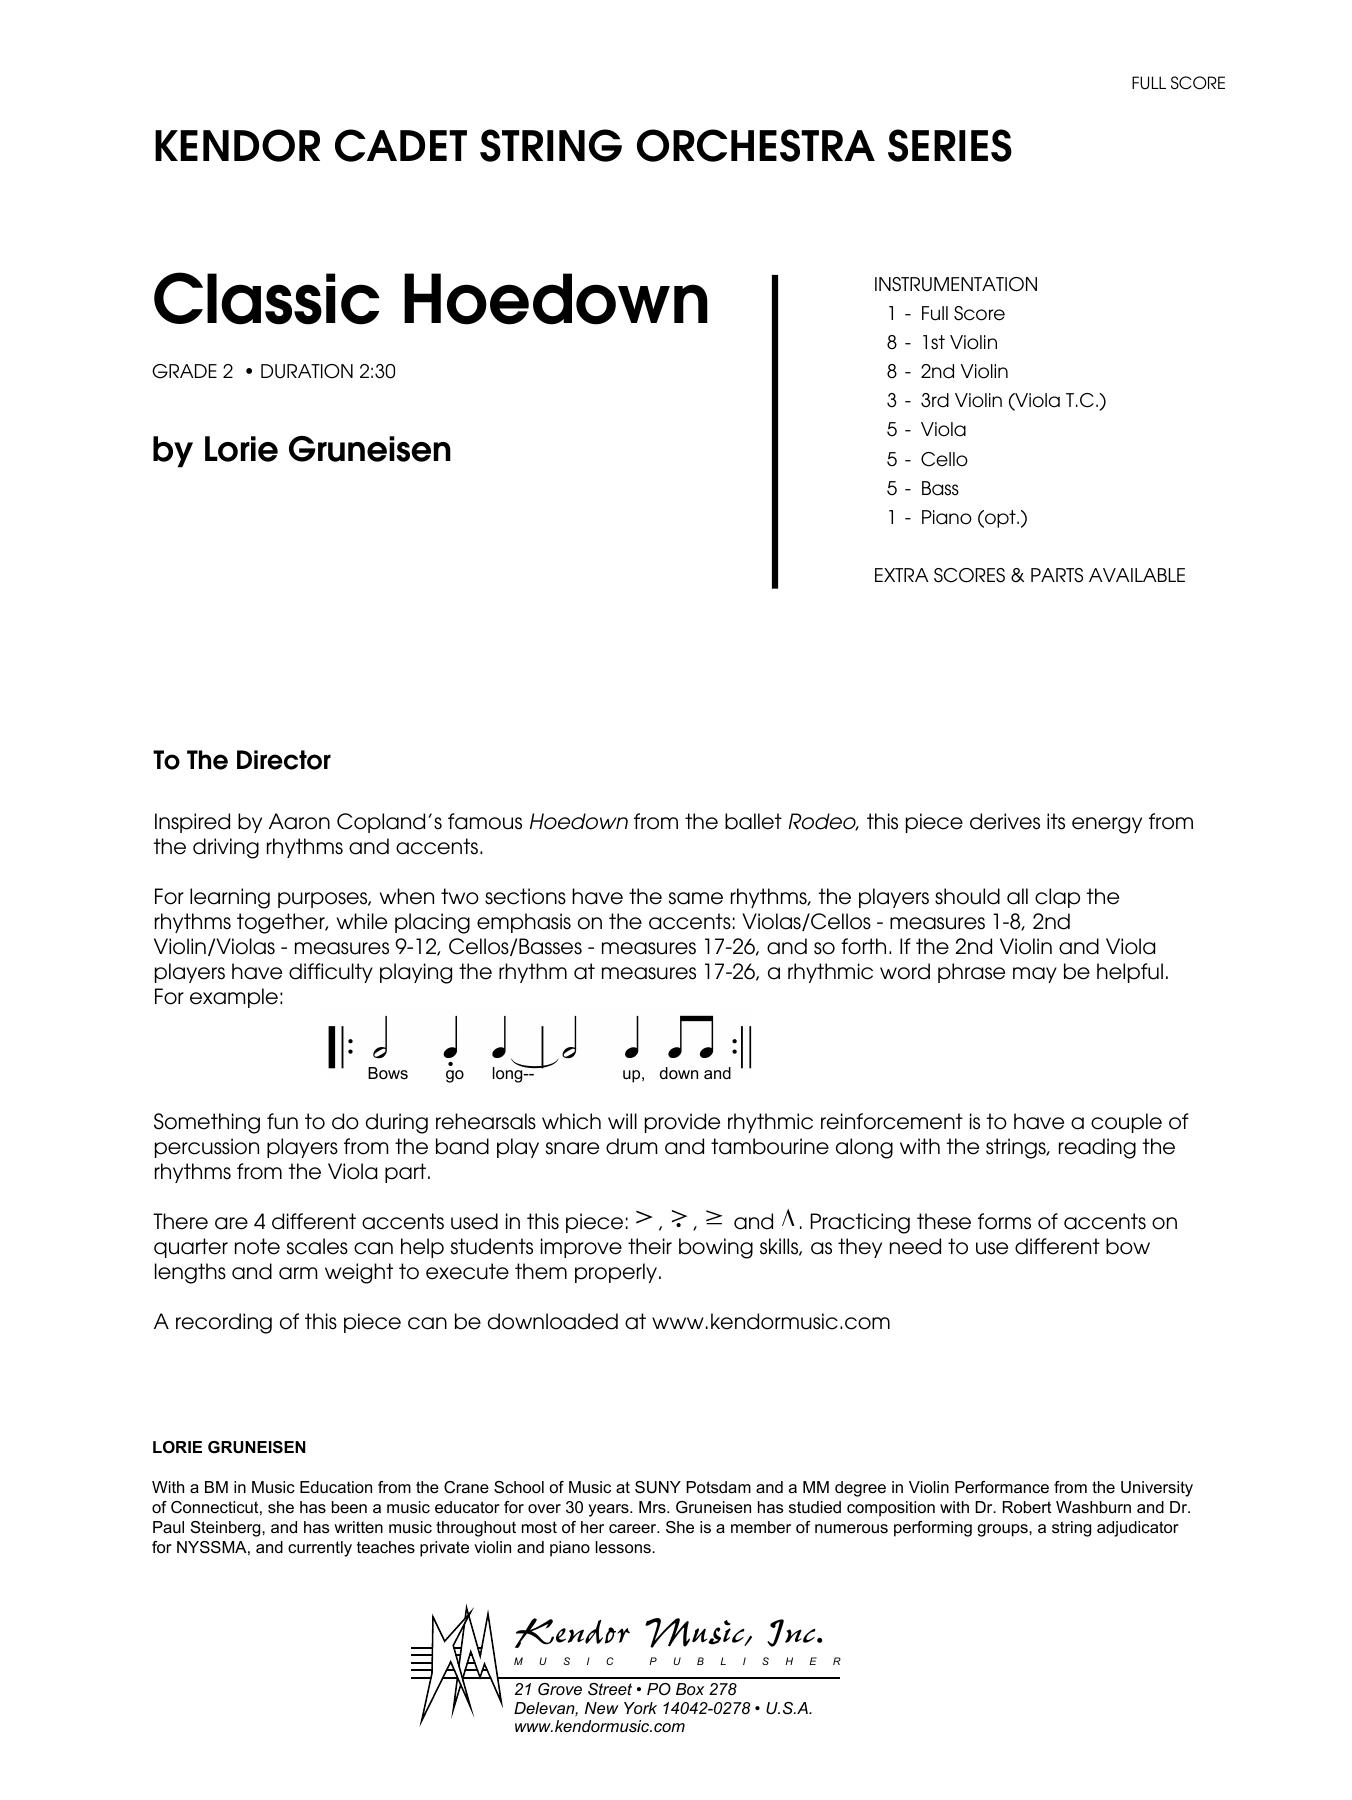 Classic Hoedown - Full Score